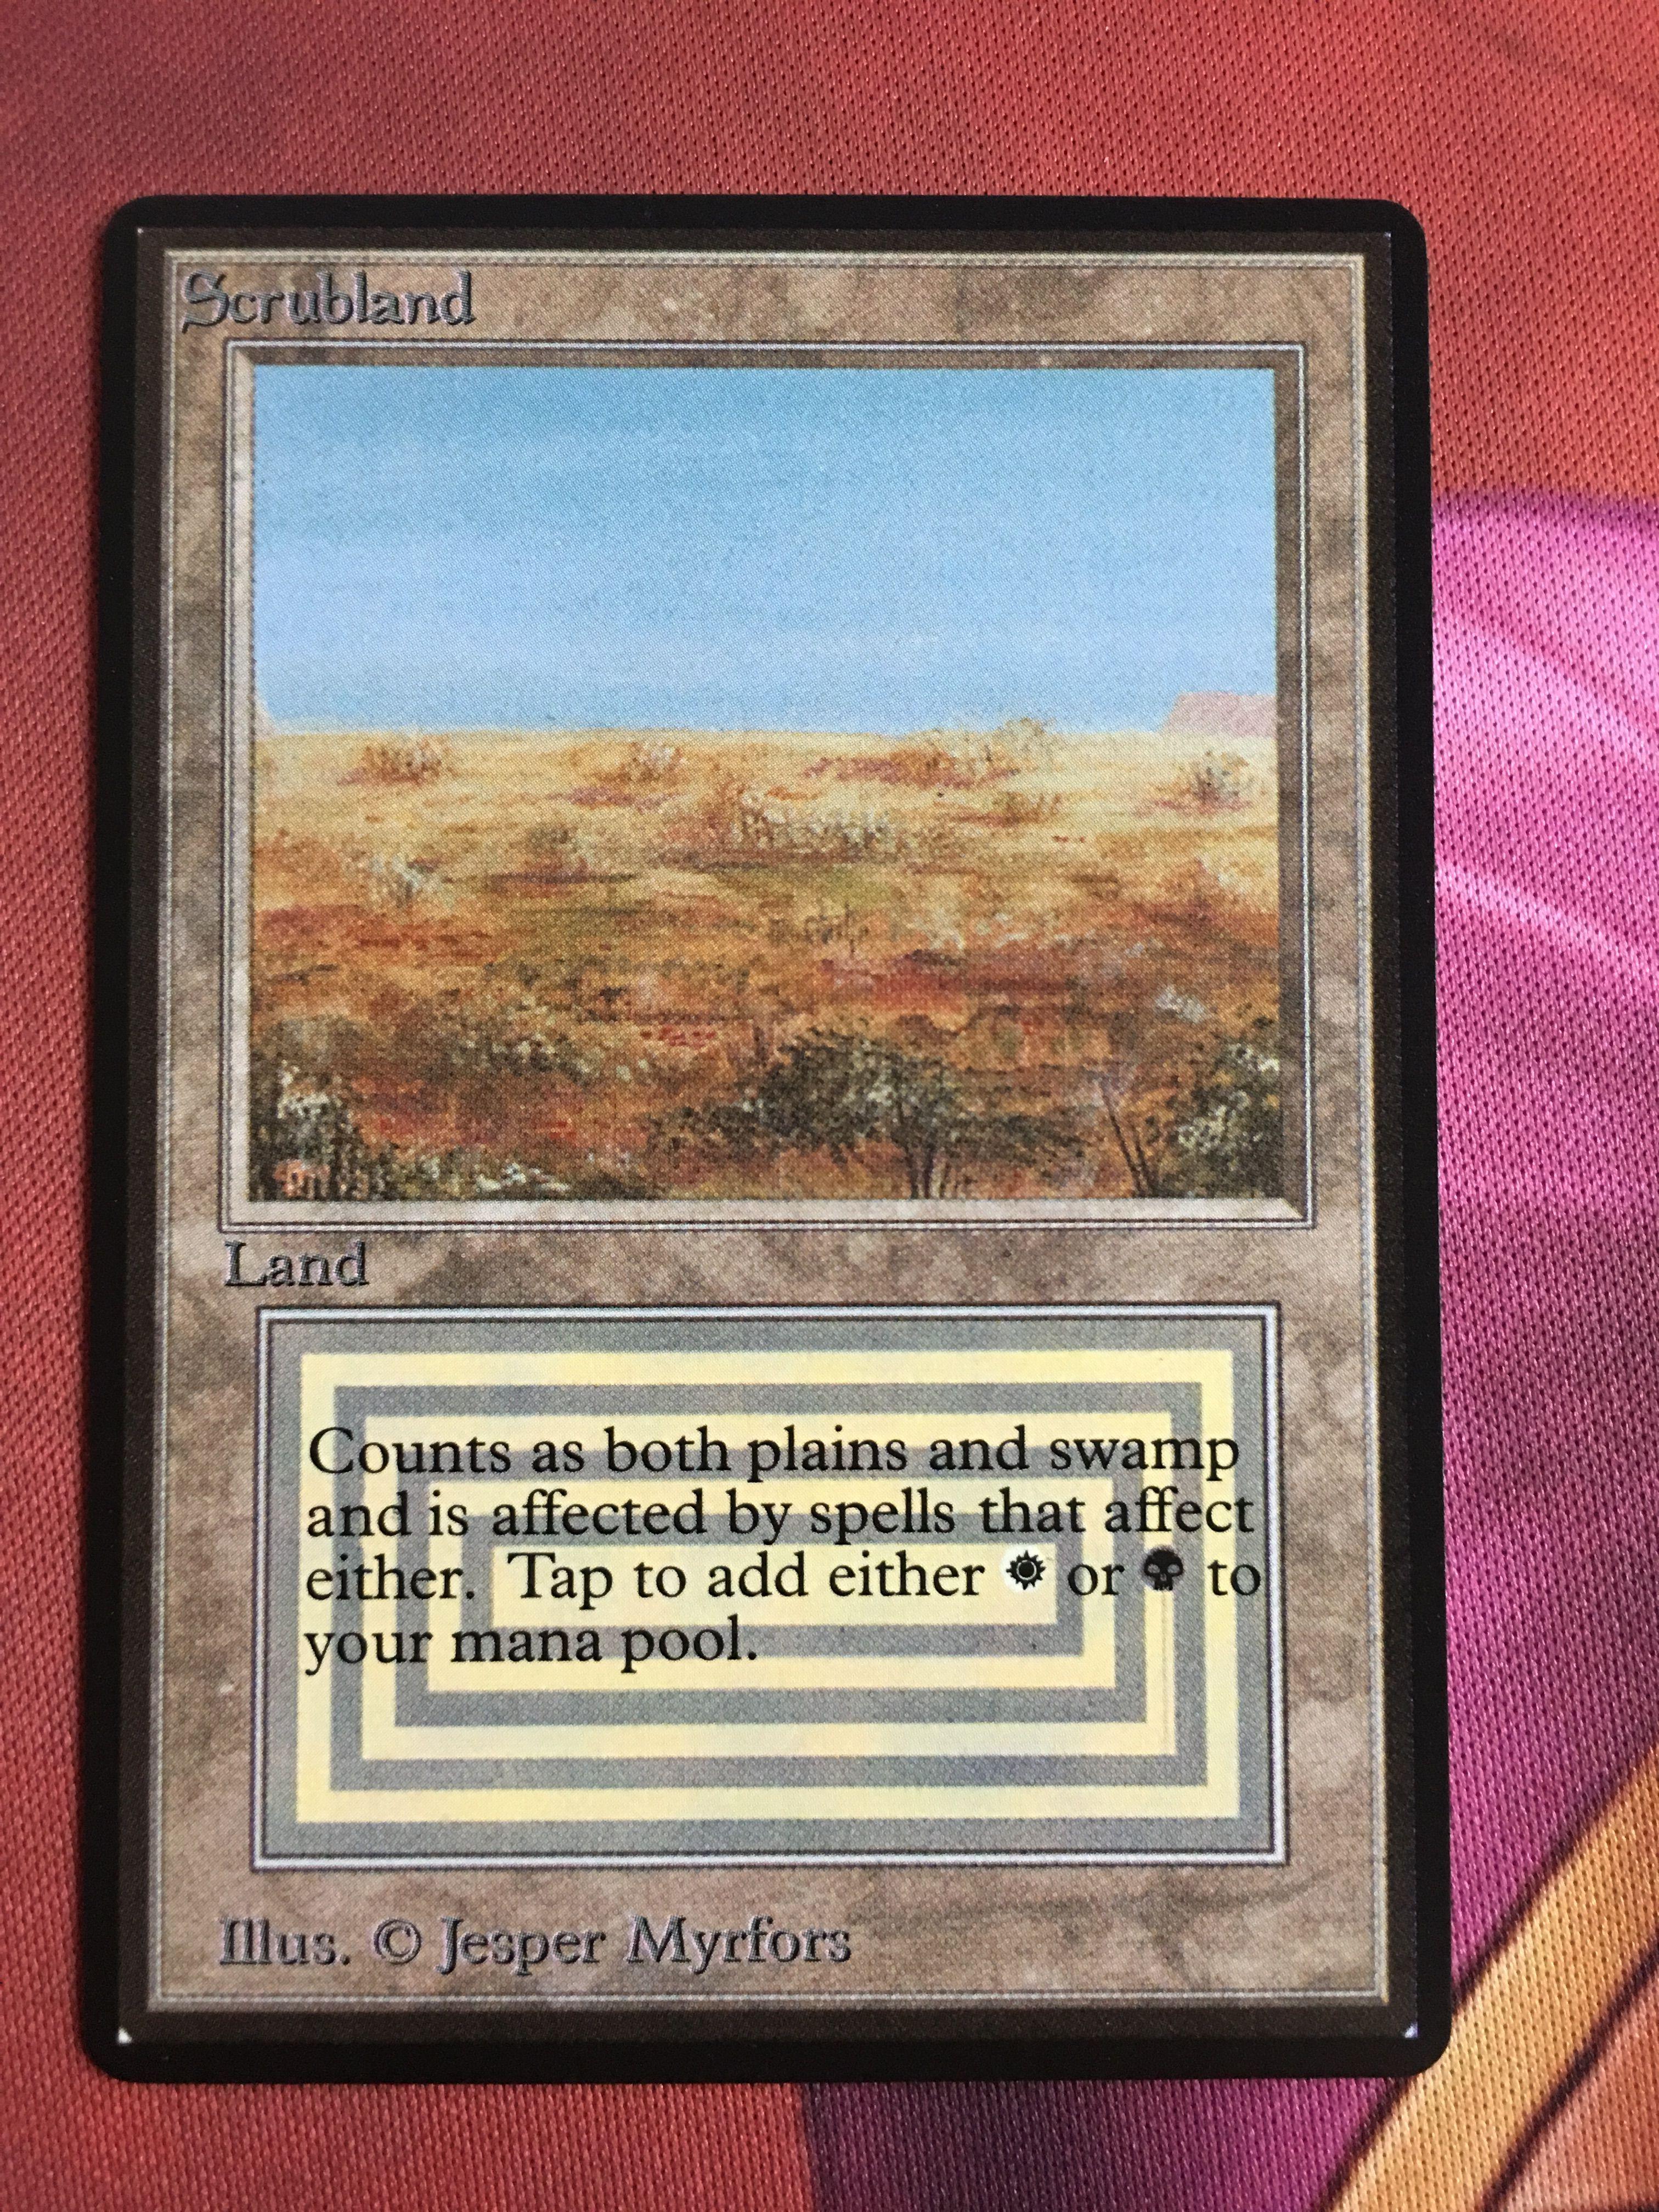 Beta Scrubland